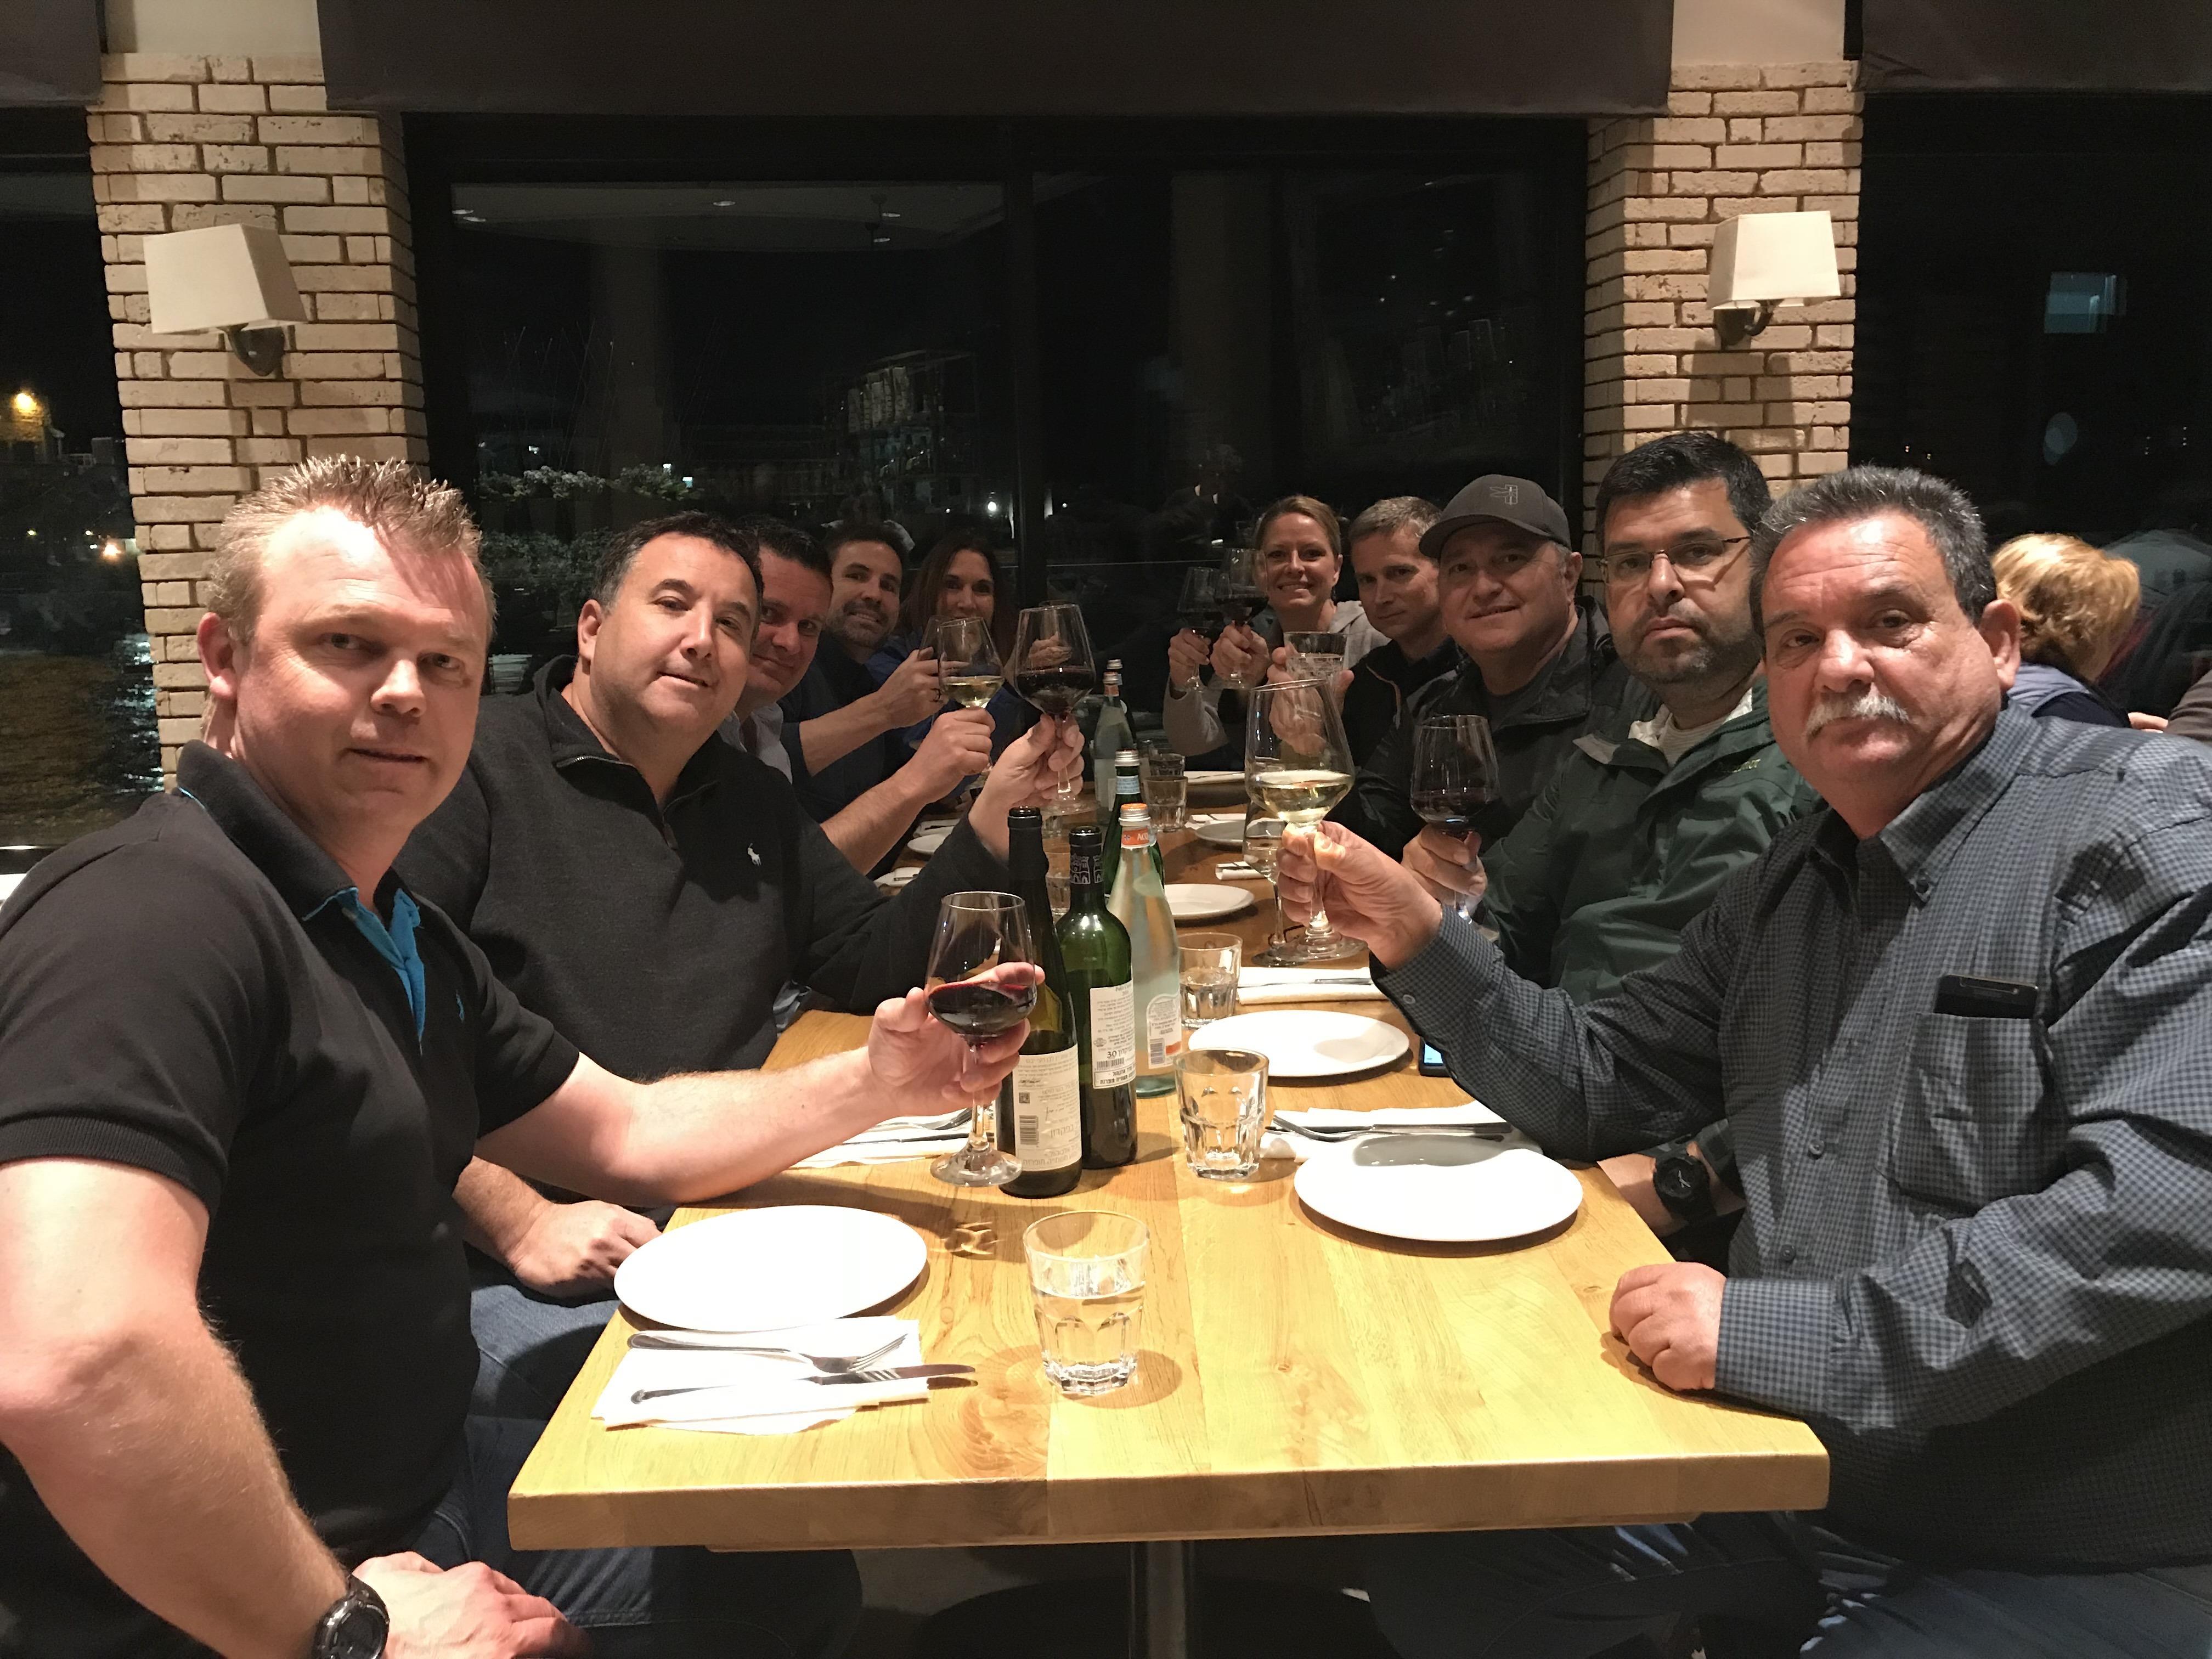 Dinner in Caesarea Chameleon Associates